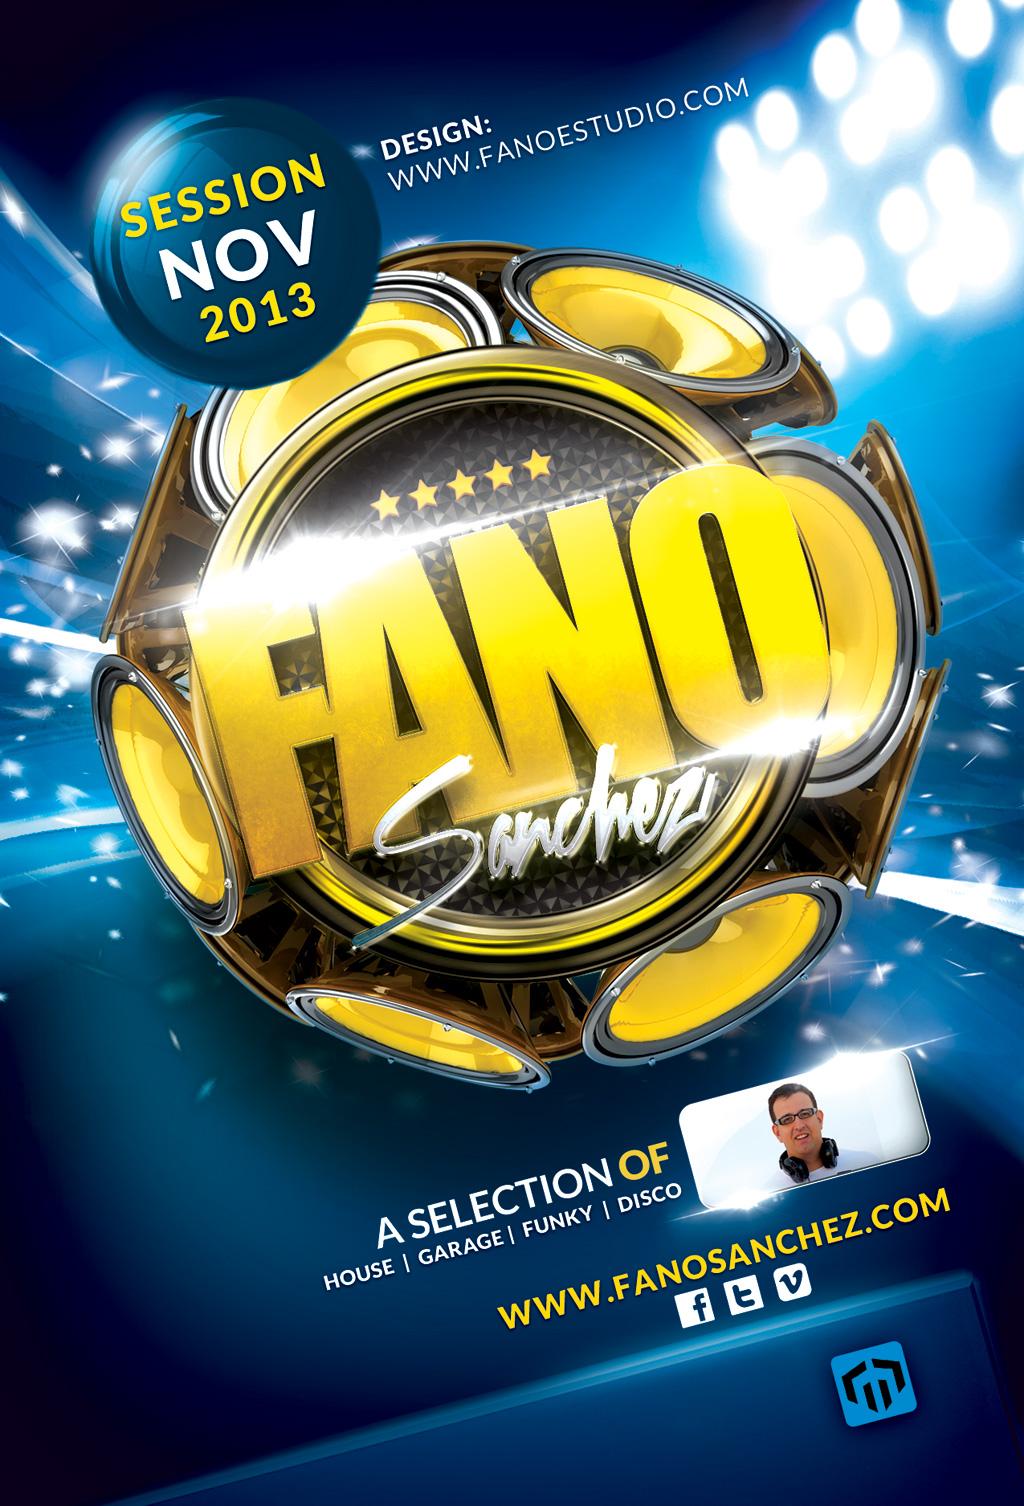 Fano Sanchez Session November 2013